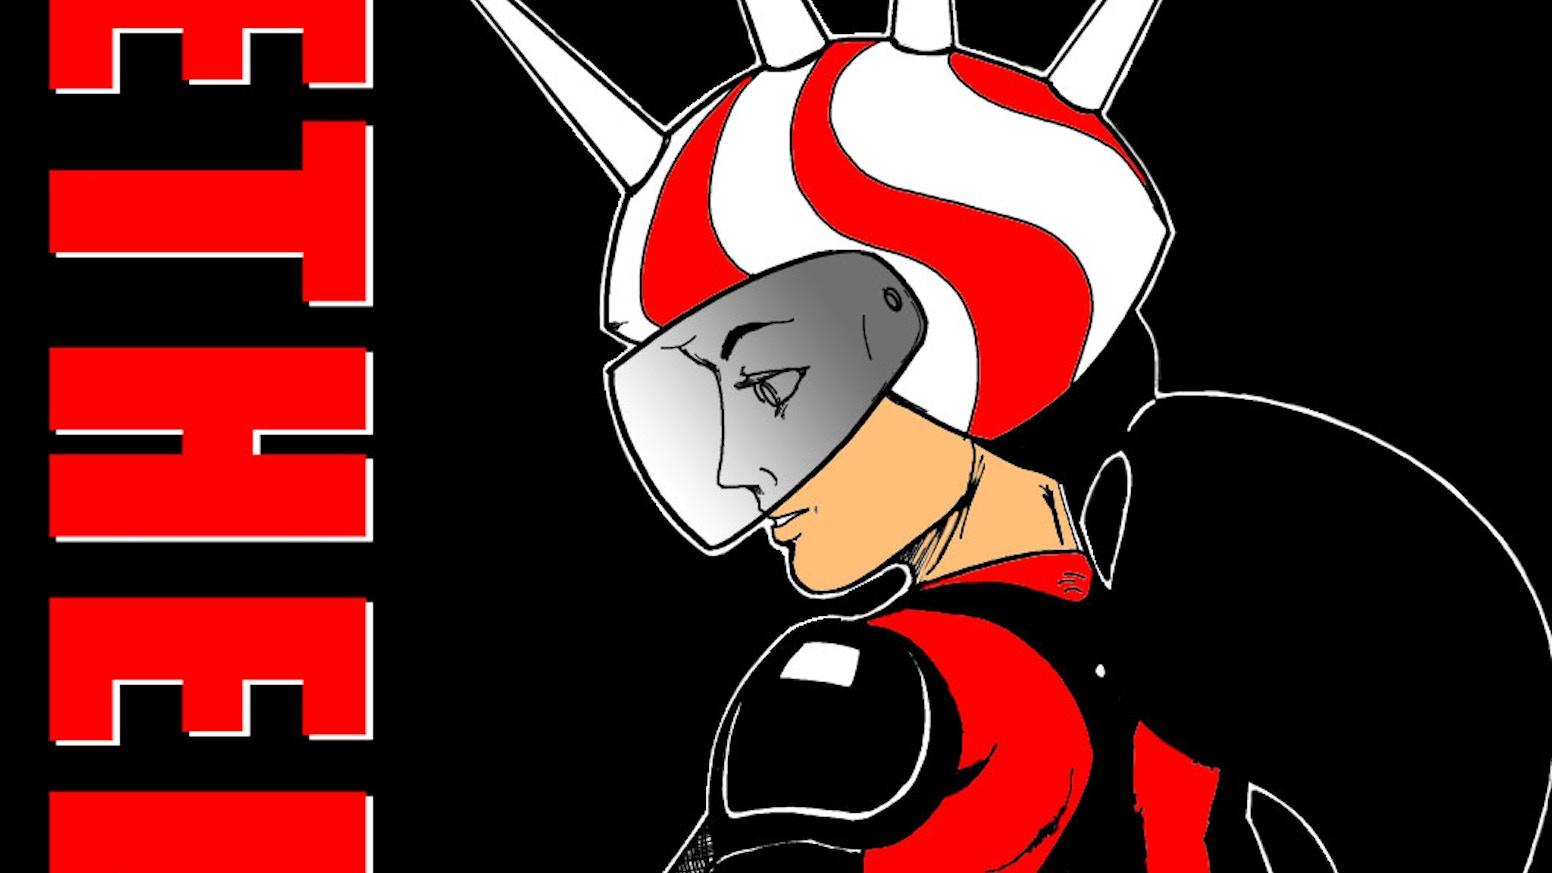 Ethel the Cyborg Ninja: Book 1 by Classic Game Room — Kickstarter